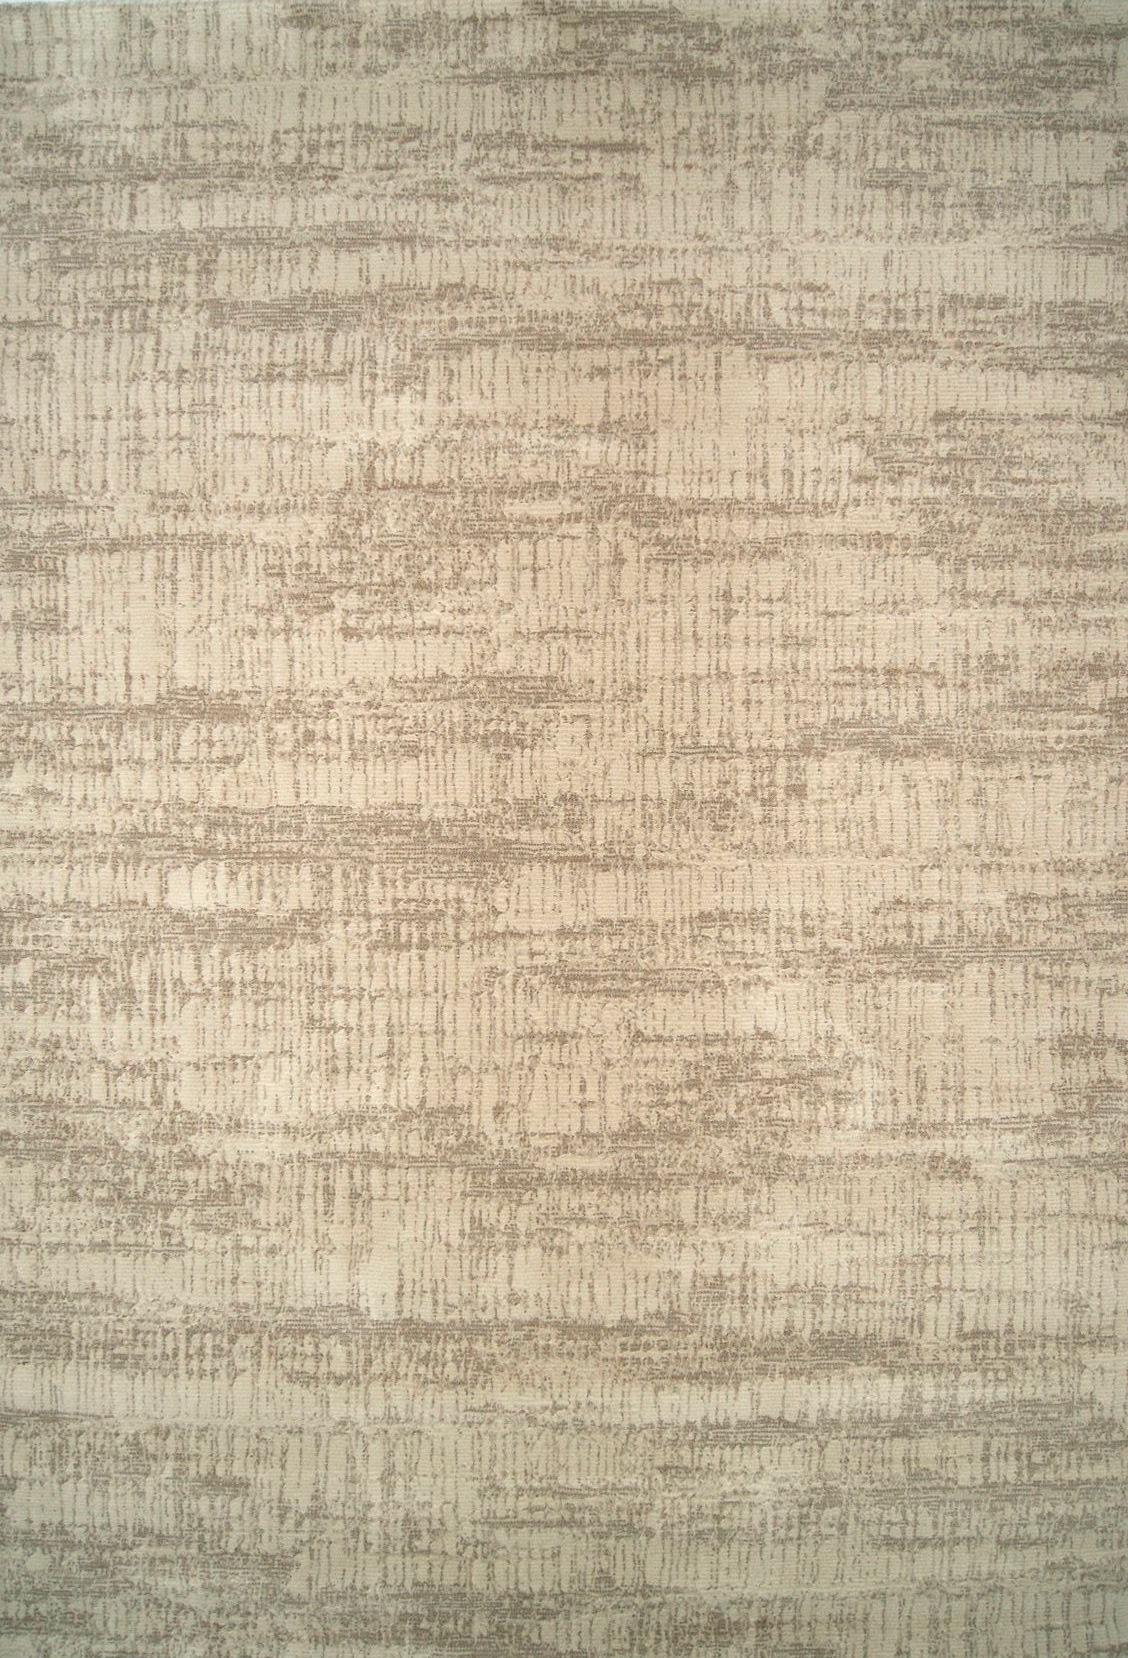 6836_050301-63032-6323-tan-area-rug-texture-polyproplene.jpg